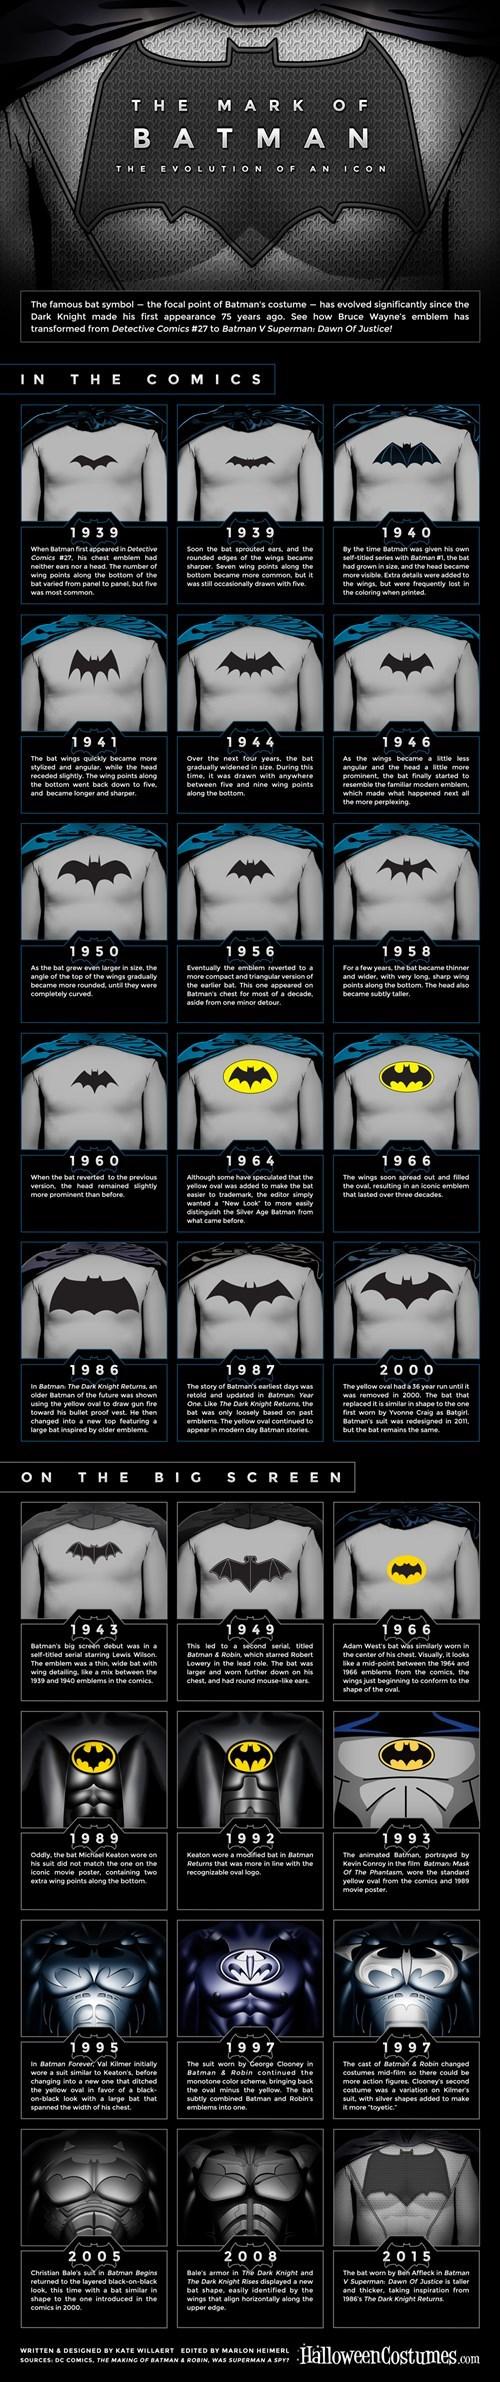 anniversary batman logo - 8256482048